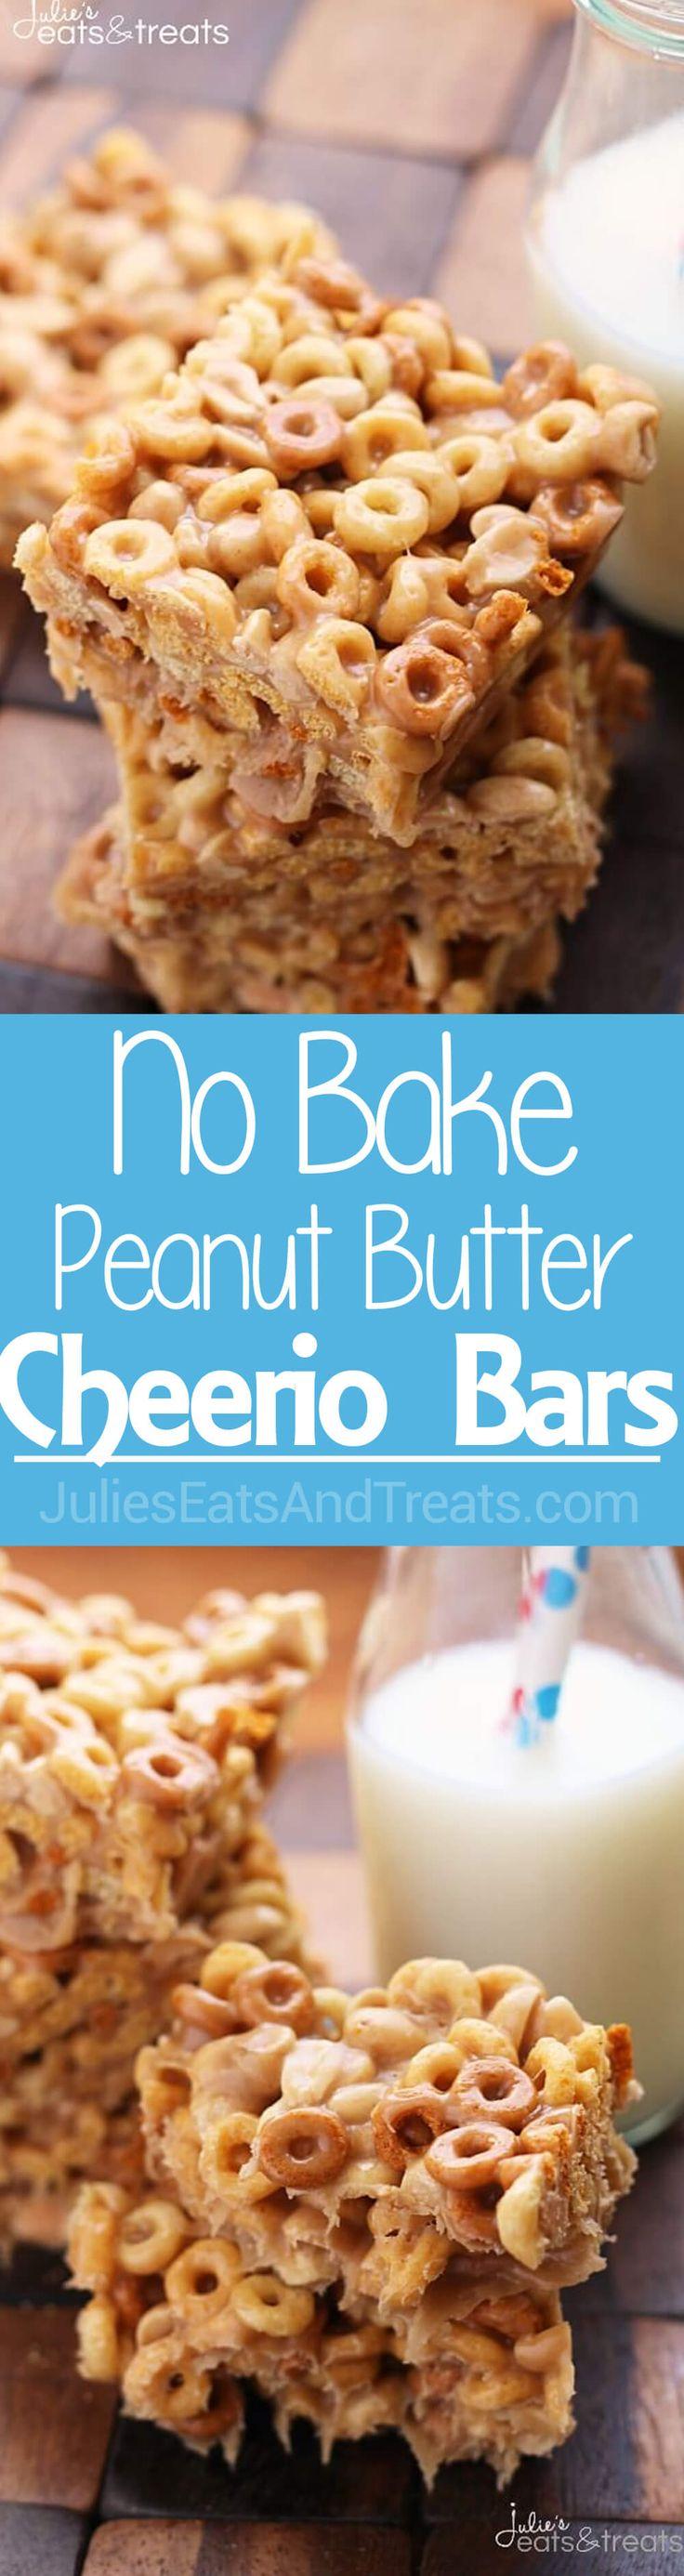 No Bake Peanut Butter Cheerio Bars ~ Ooey, Gooey, Peanut Buttery Bars stuffed with Peanut Butter Cheerios! So Delicious and So Easy! ~ https://www.julieseatsandtreats.com